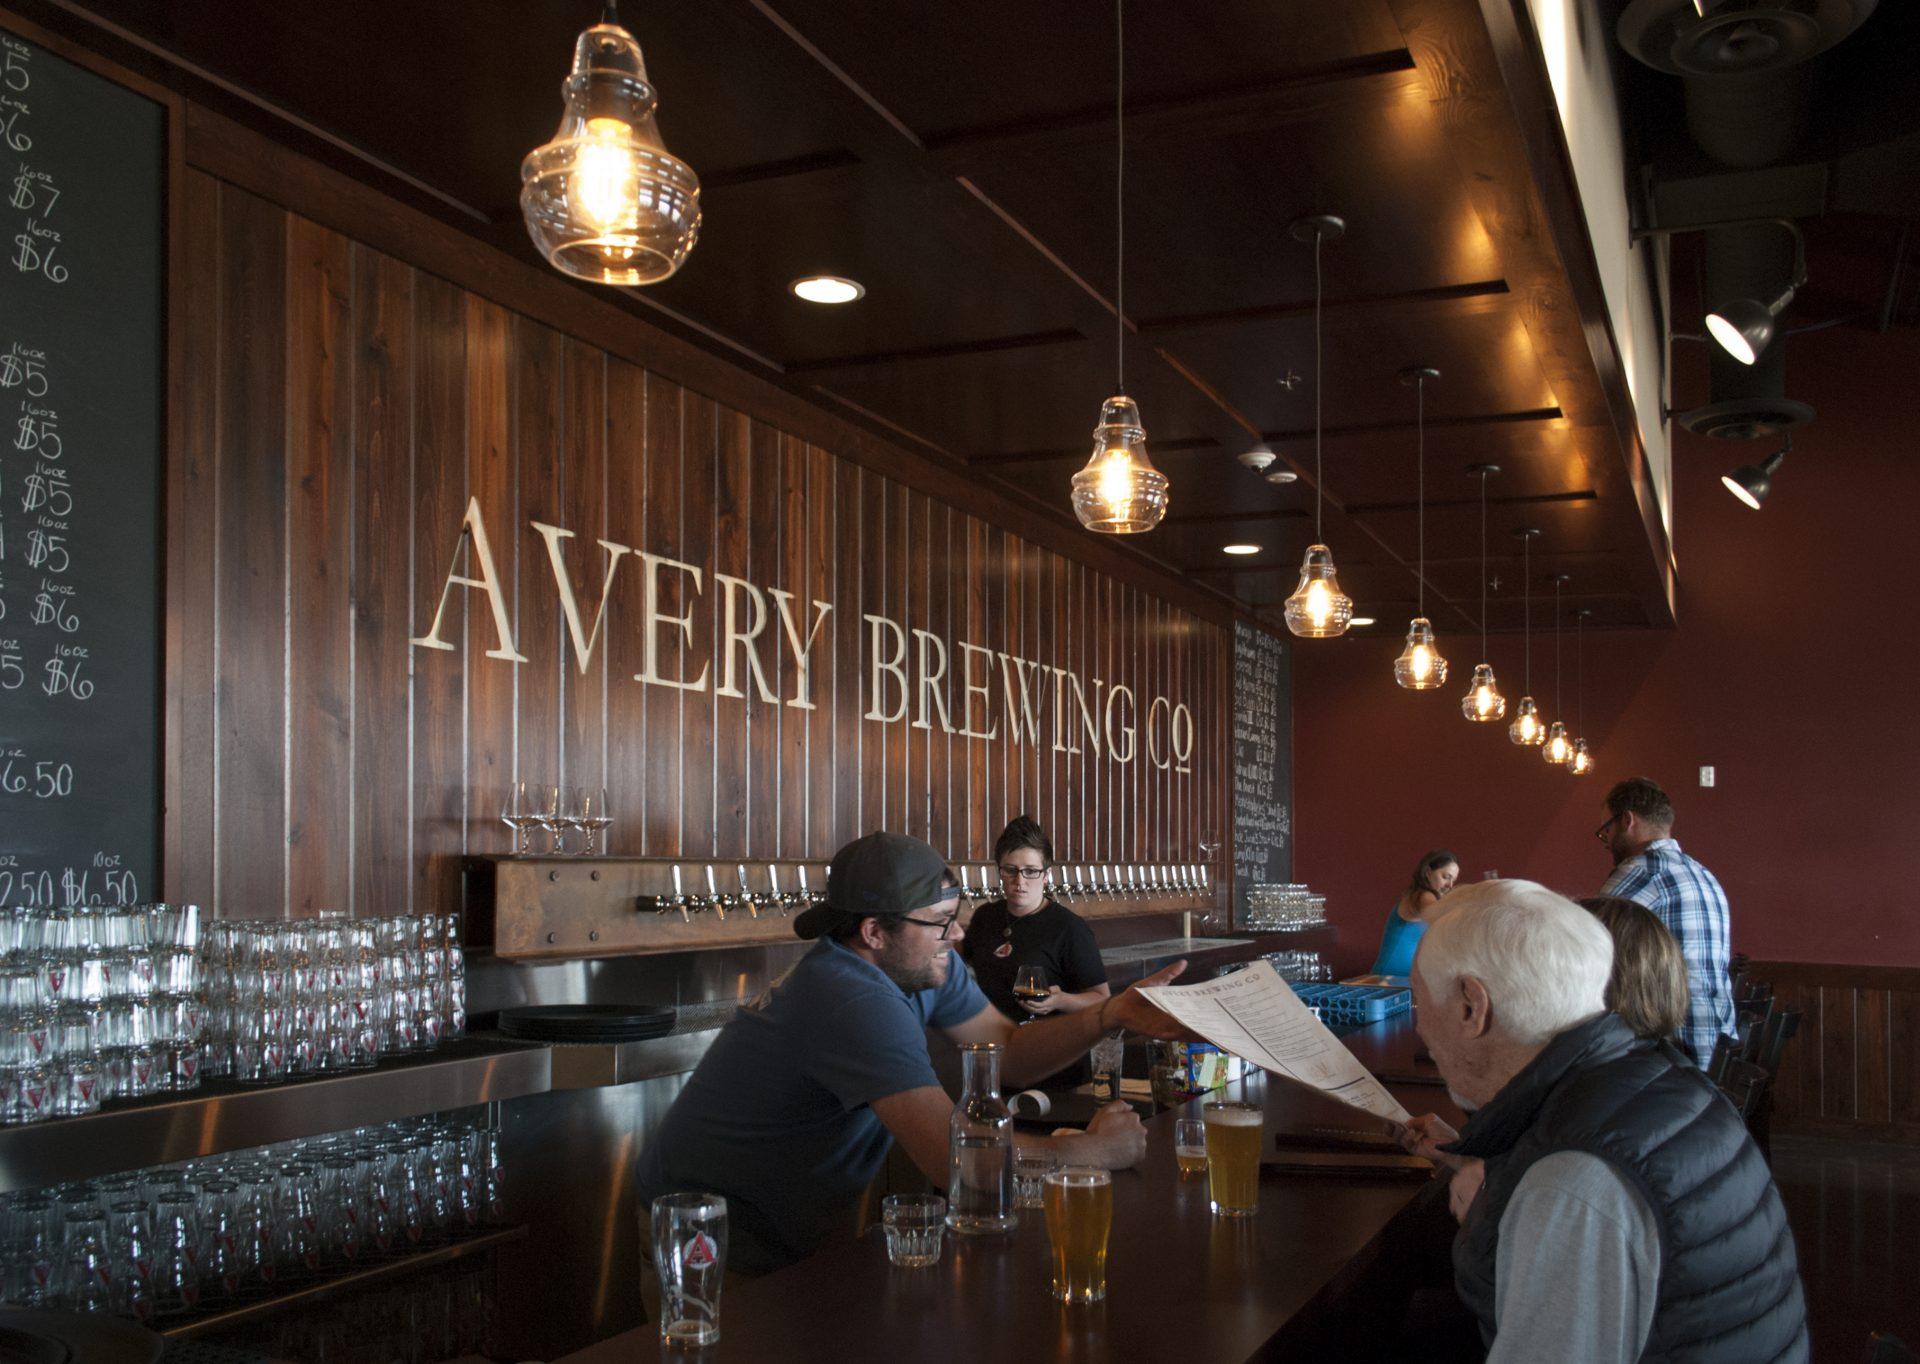 Avery Brewing Company Restaurant